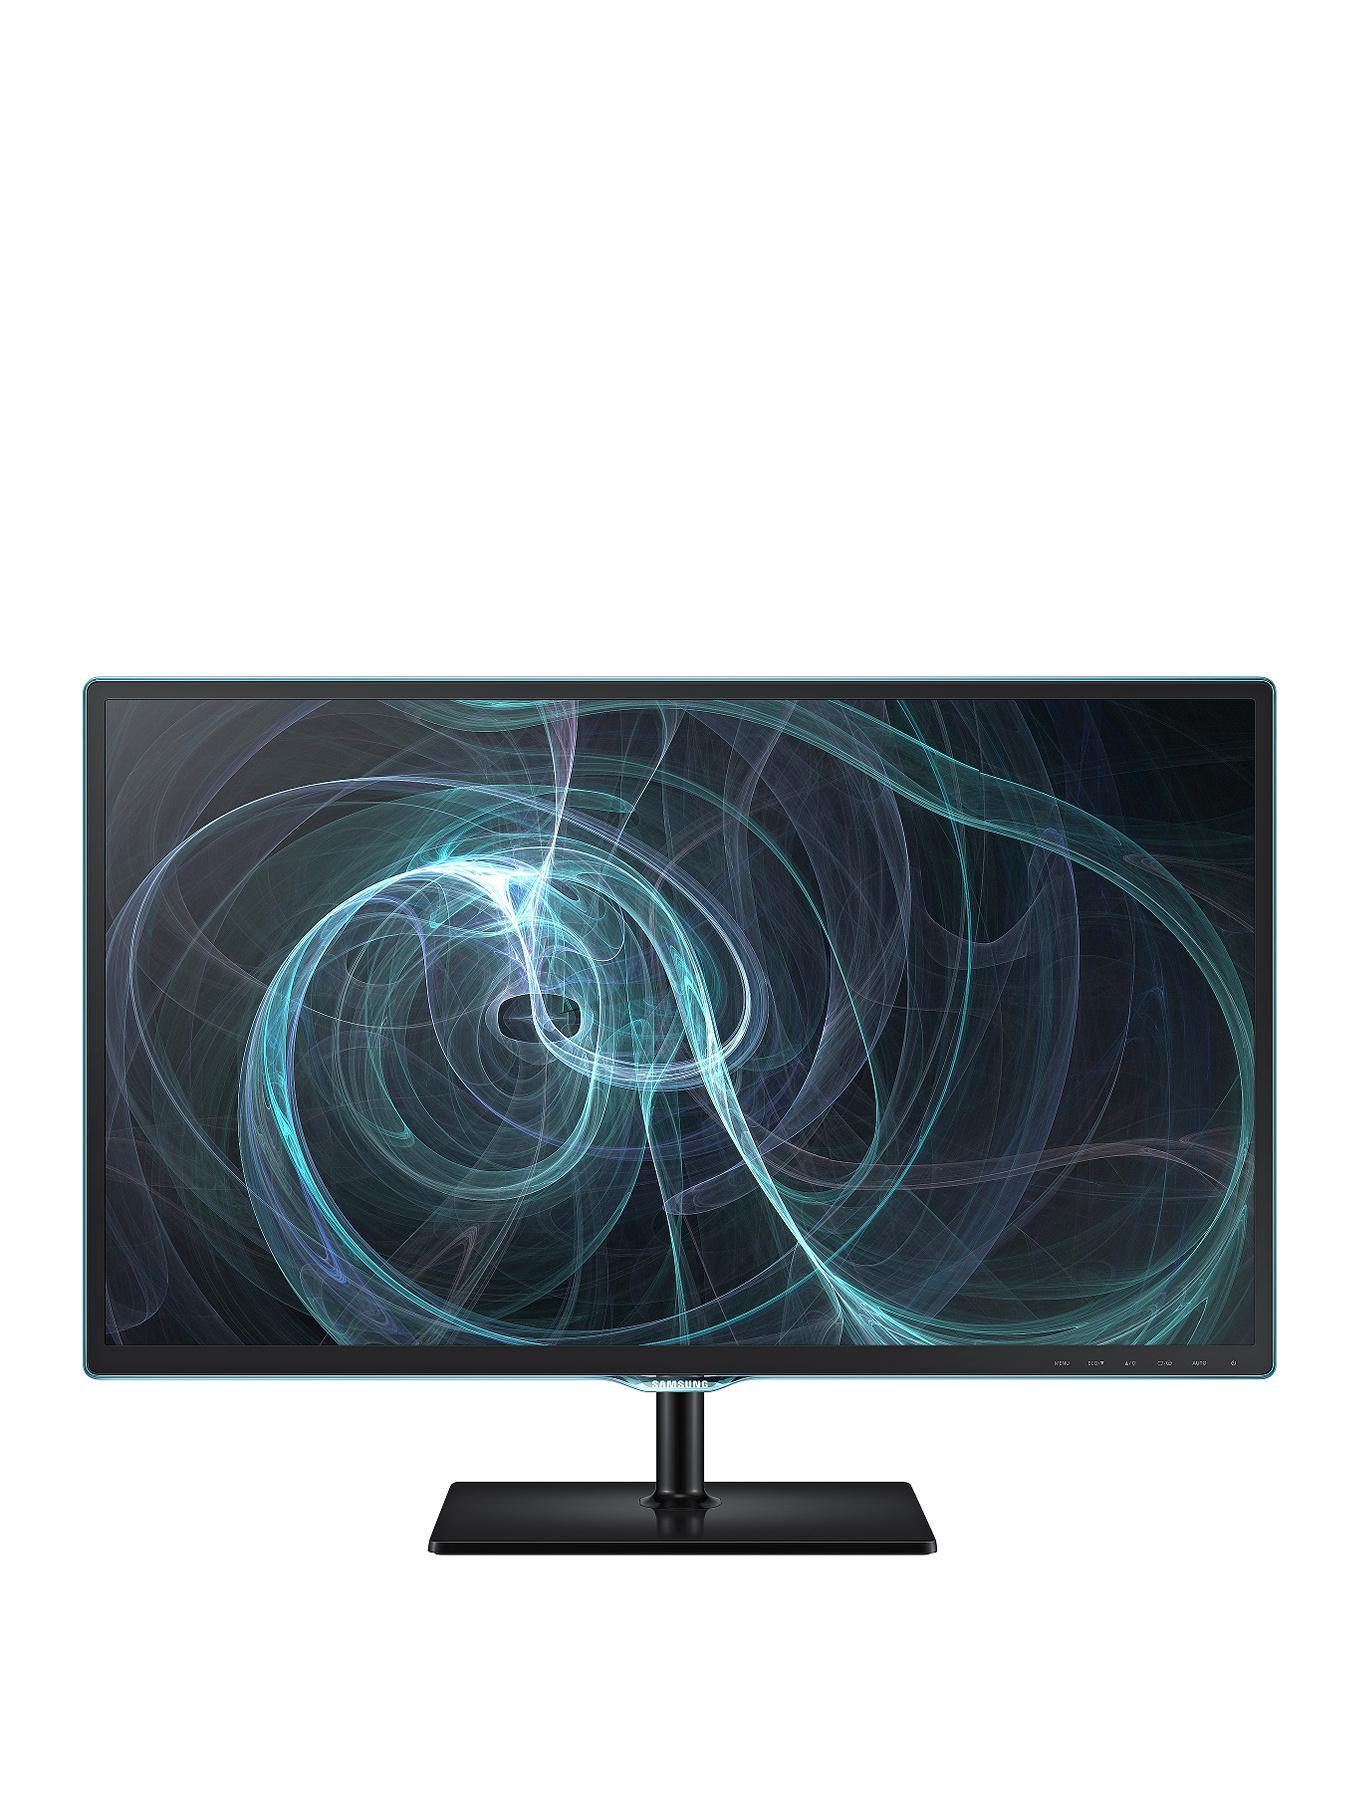 Samsung S24D390HL 23.6 inch PLS LED, 1920 x 1080, VGA, HDMI Monitor